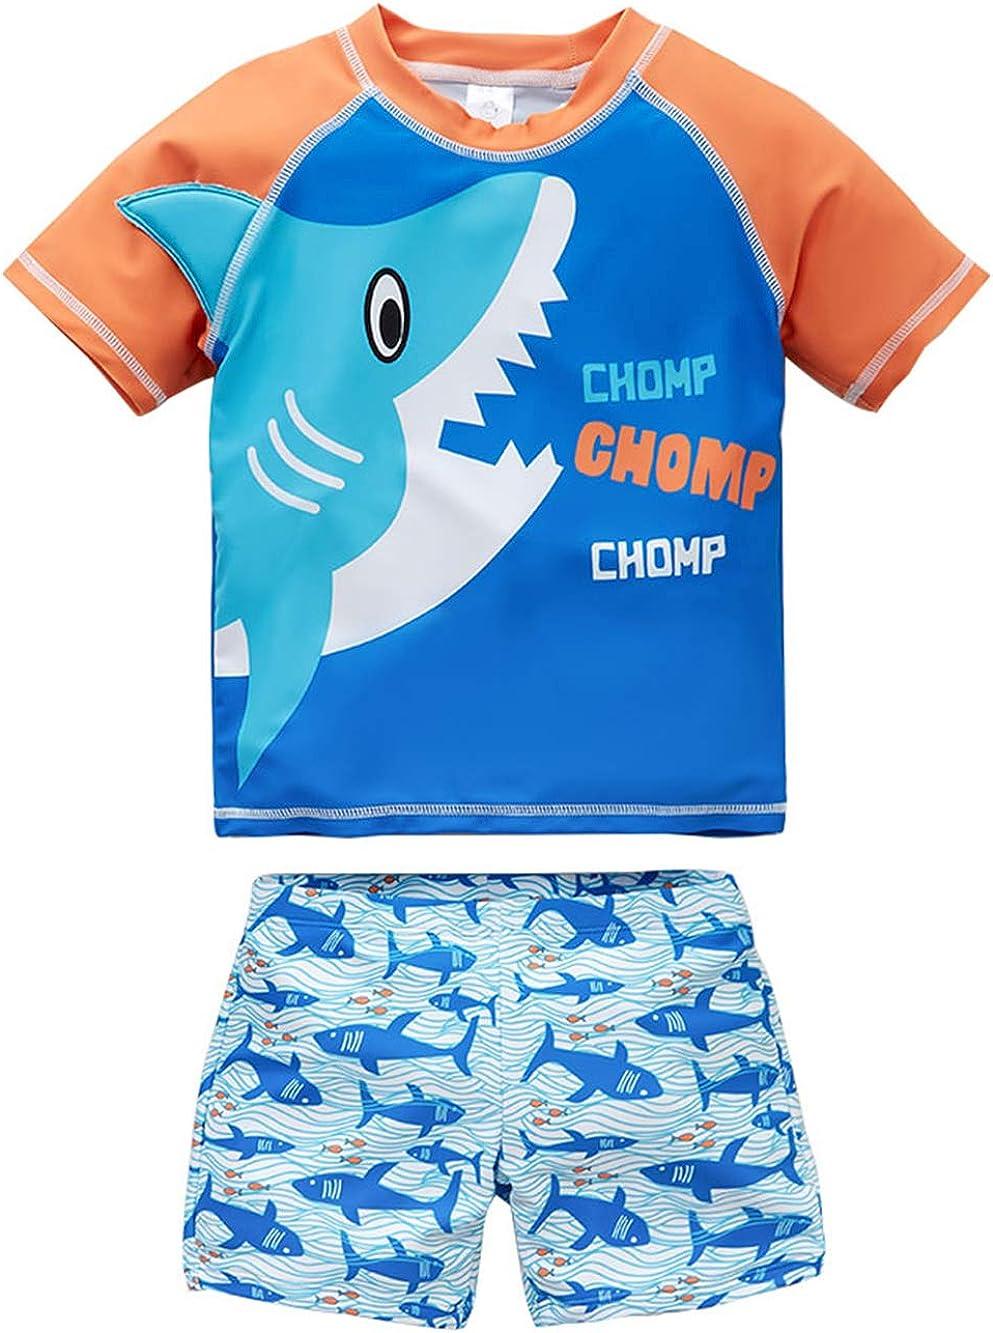 kavkas Baby Special sale item Boy Swimsuit Toddler Rash Set Guard B Two Piece Swim Ranking TOP7